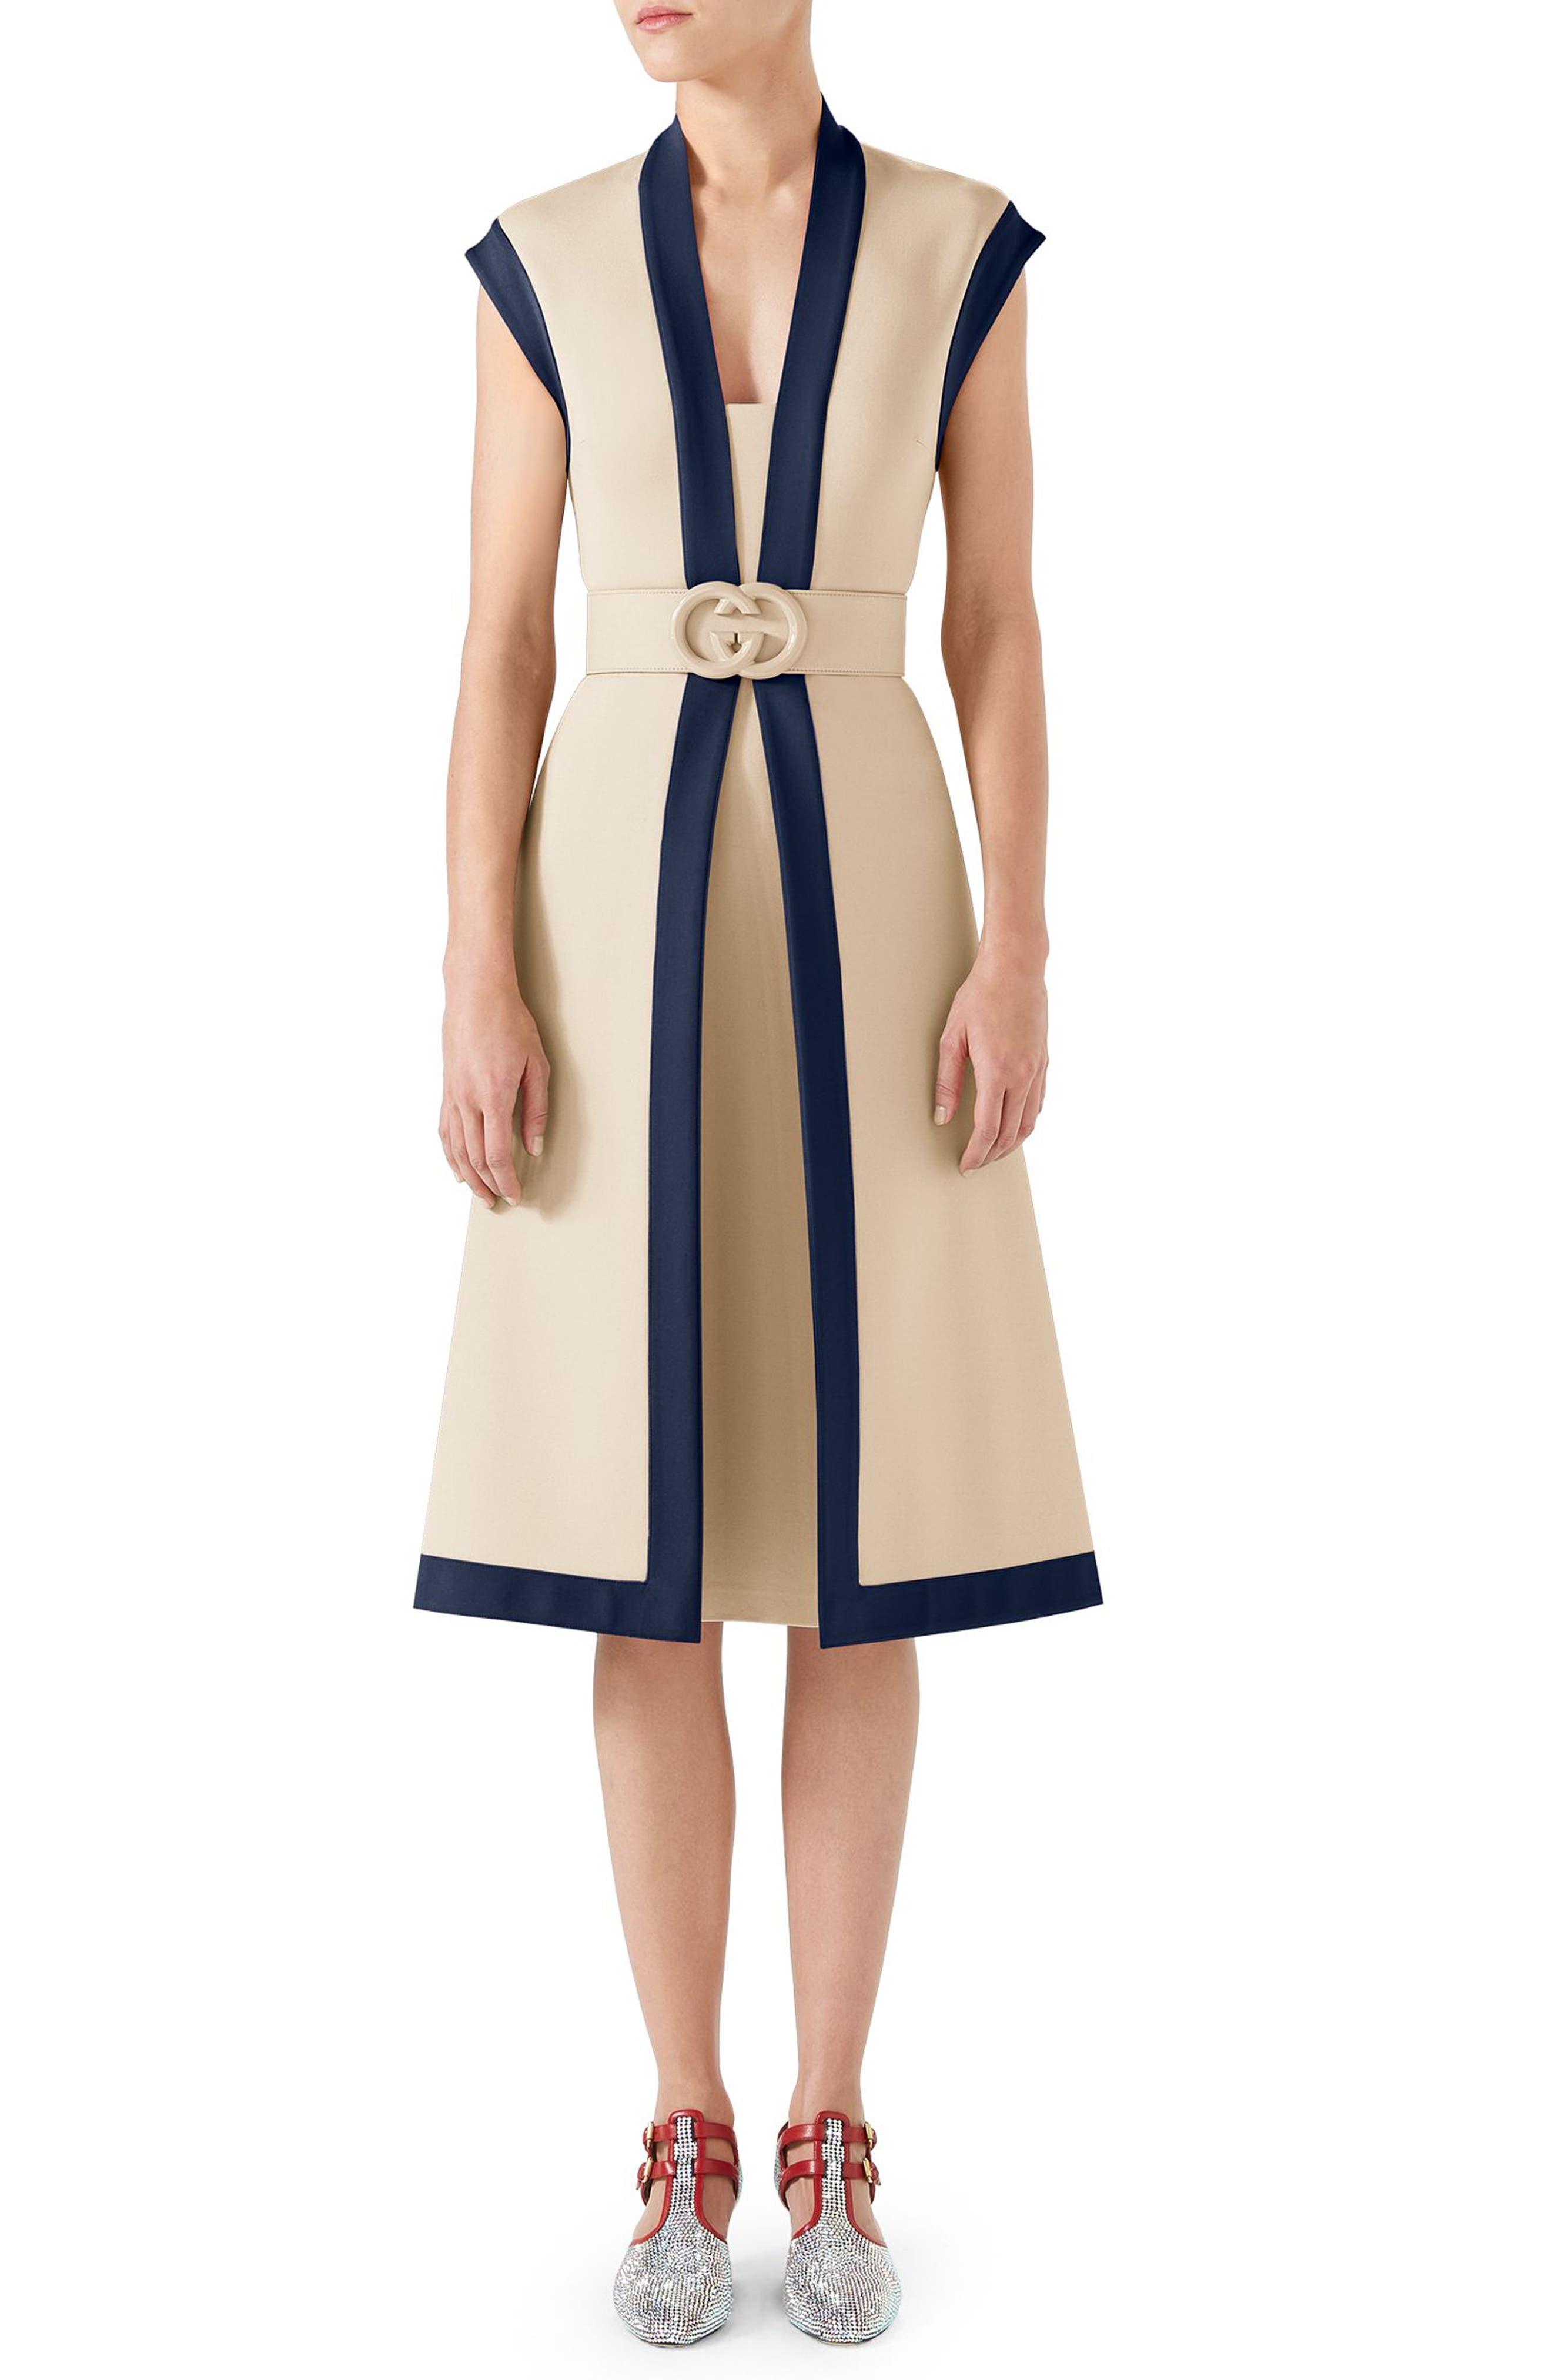 Jersey dress with GG belt - Nude & Neutrals Gucci 8dtOz